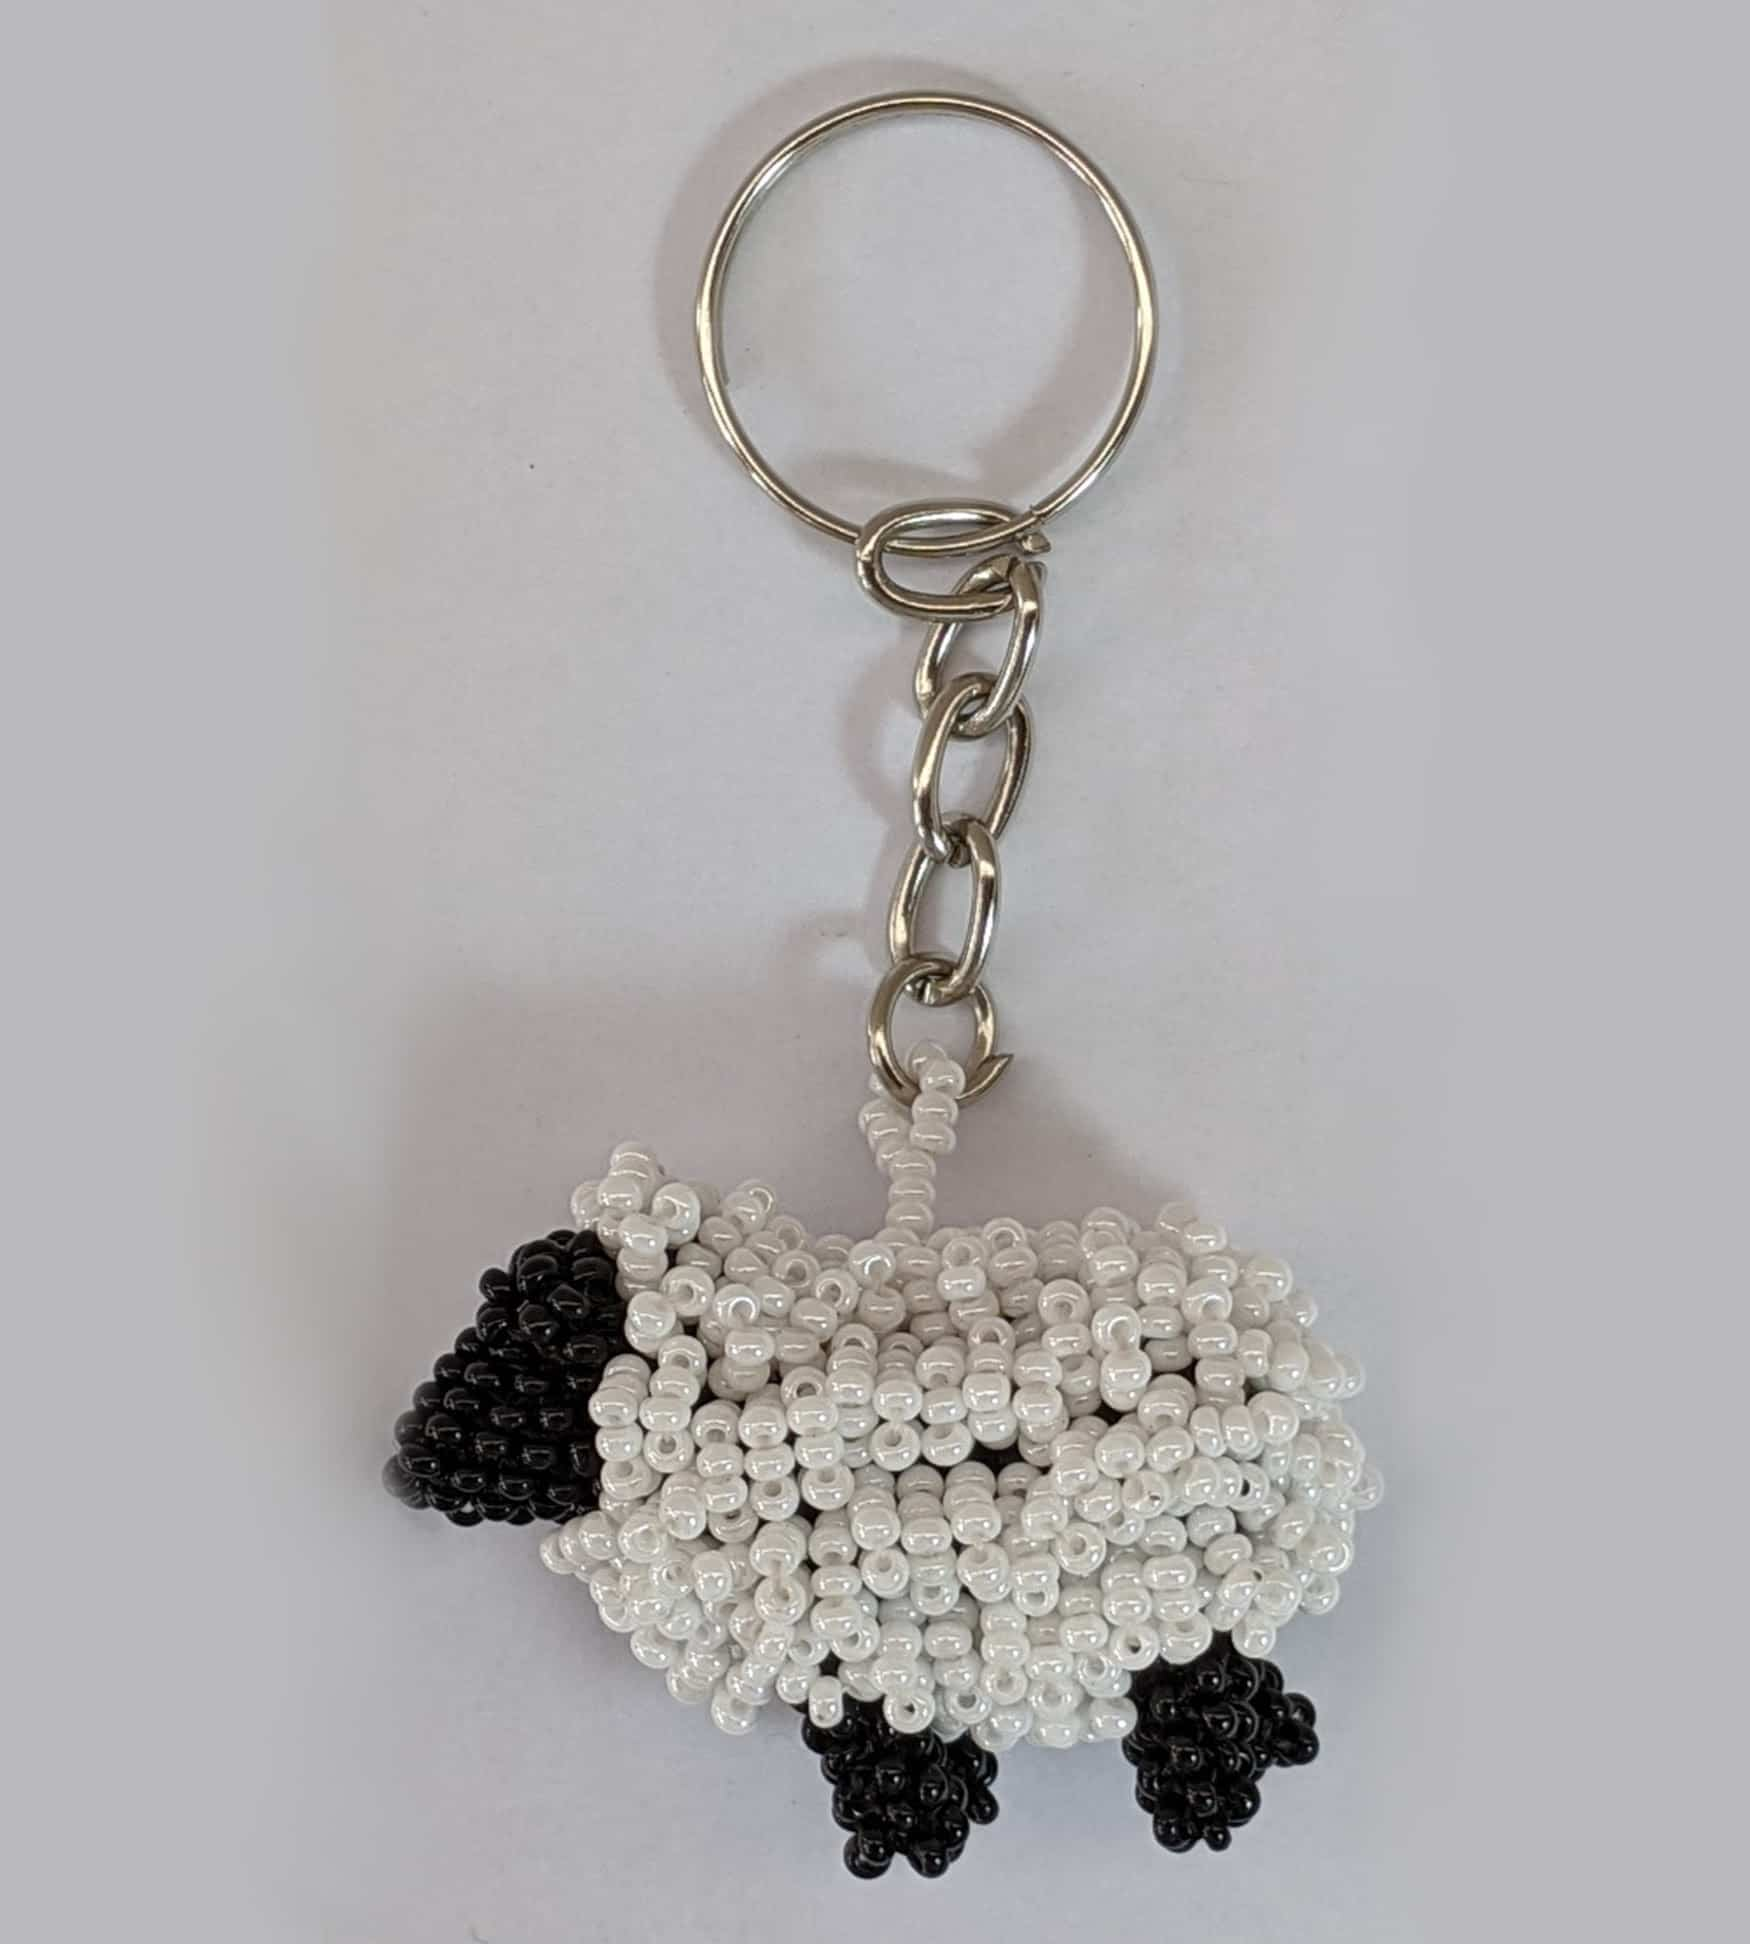 Sheep Beaded Key RIng